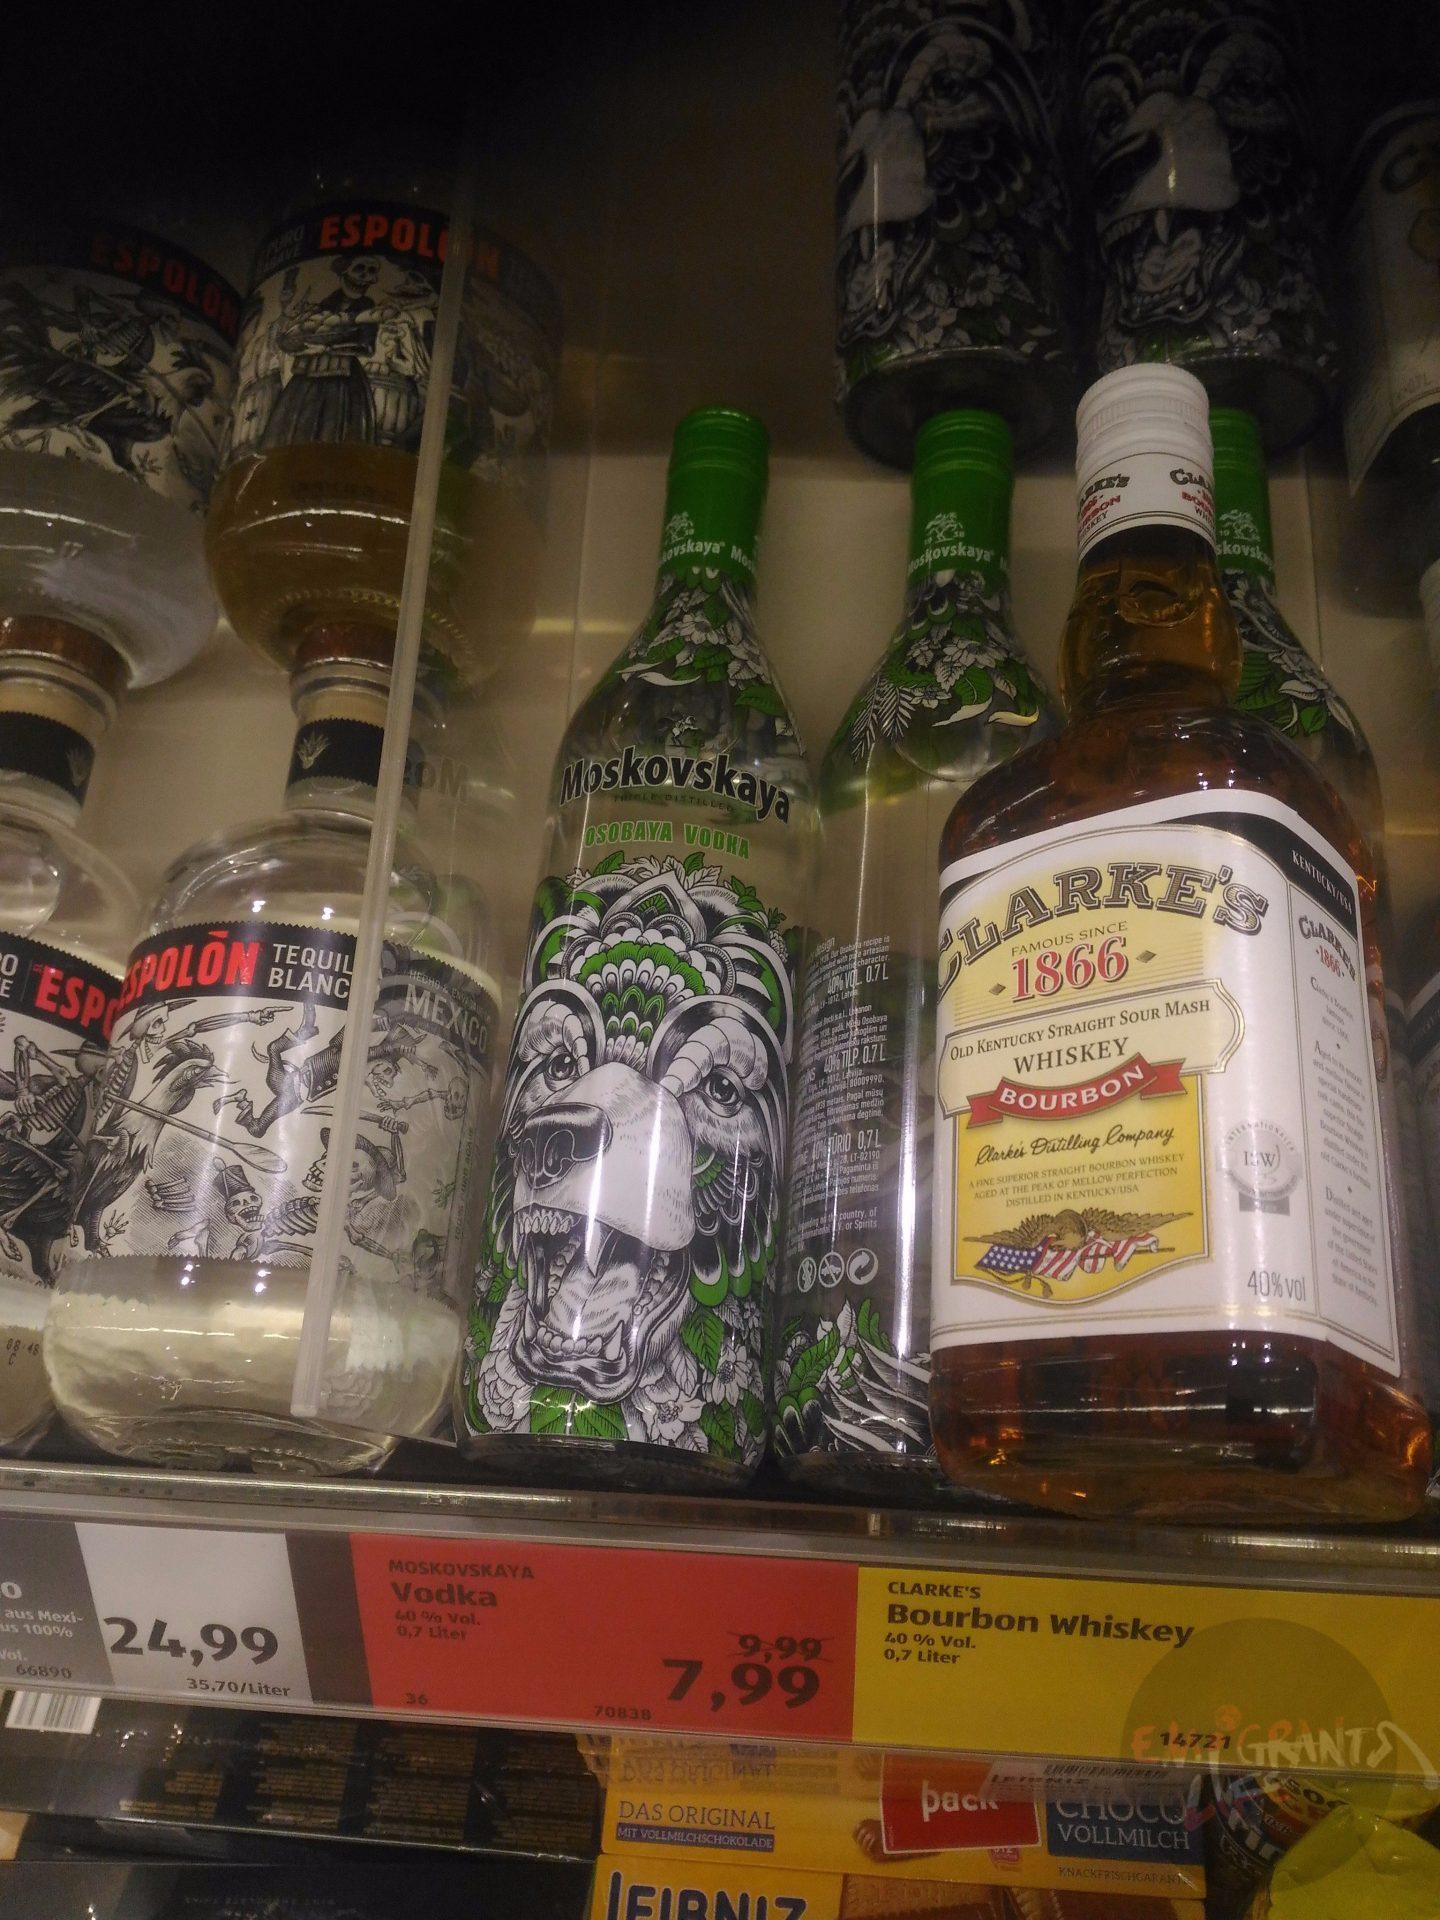 Moskovskaya водка — das ist gut